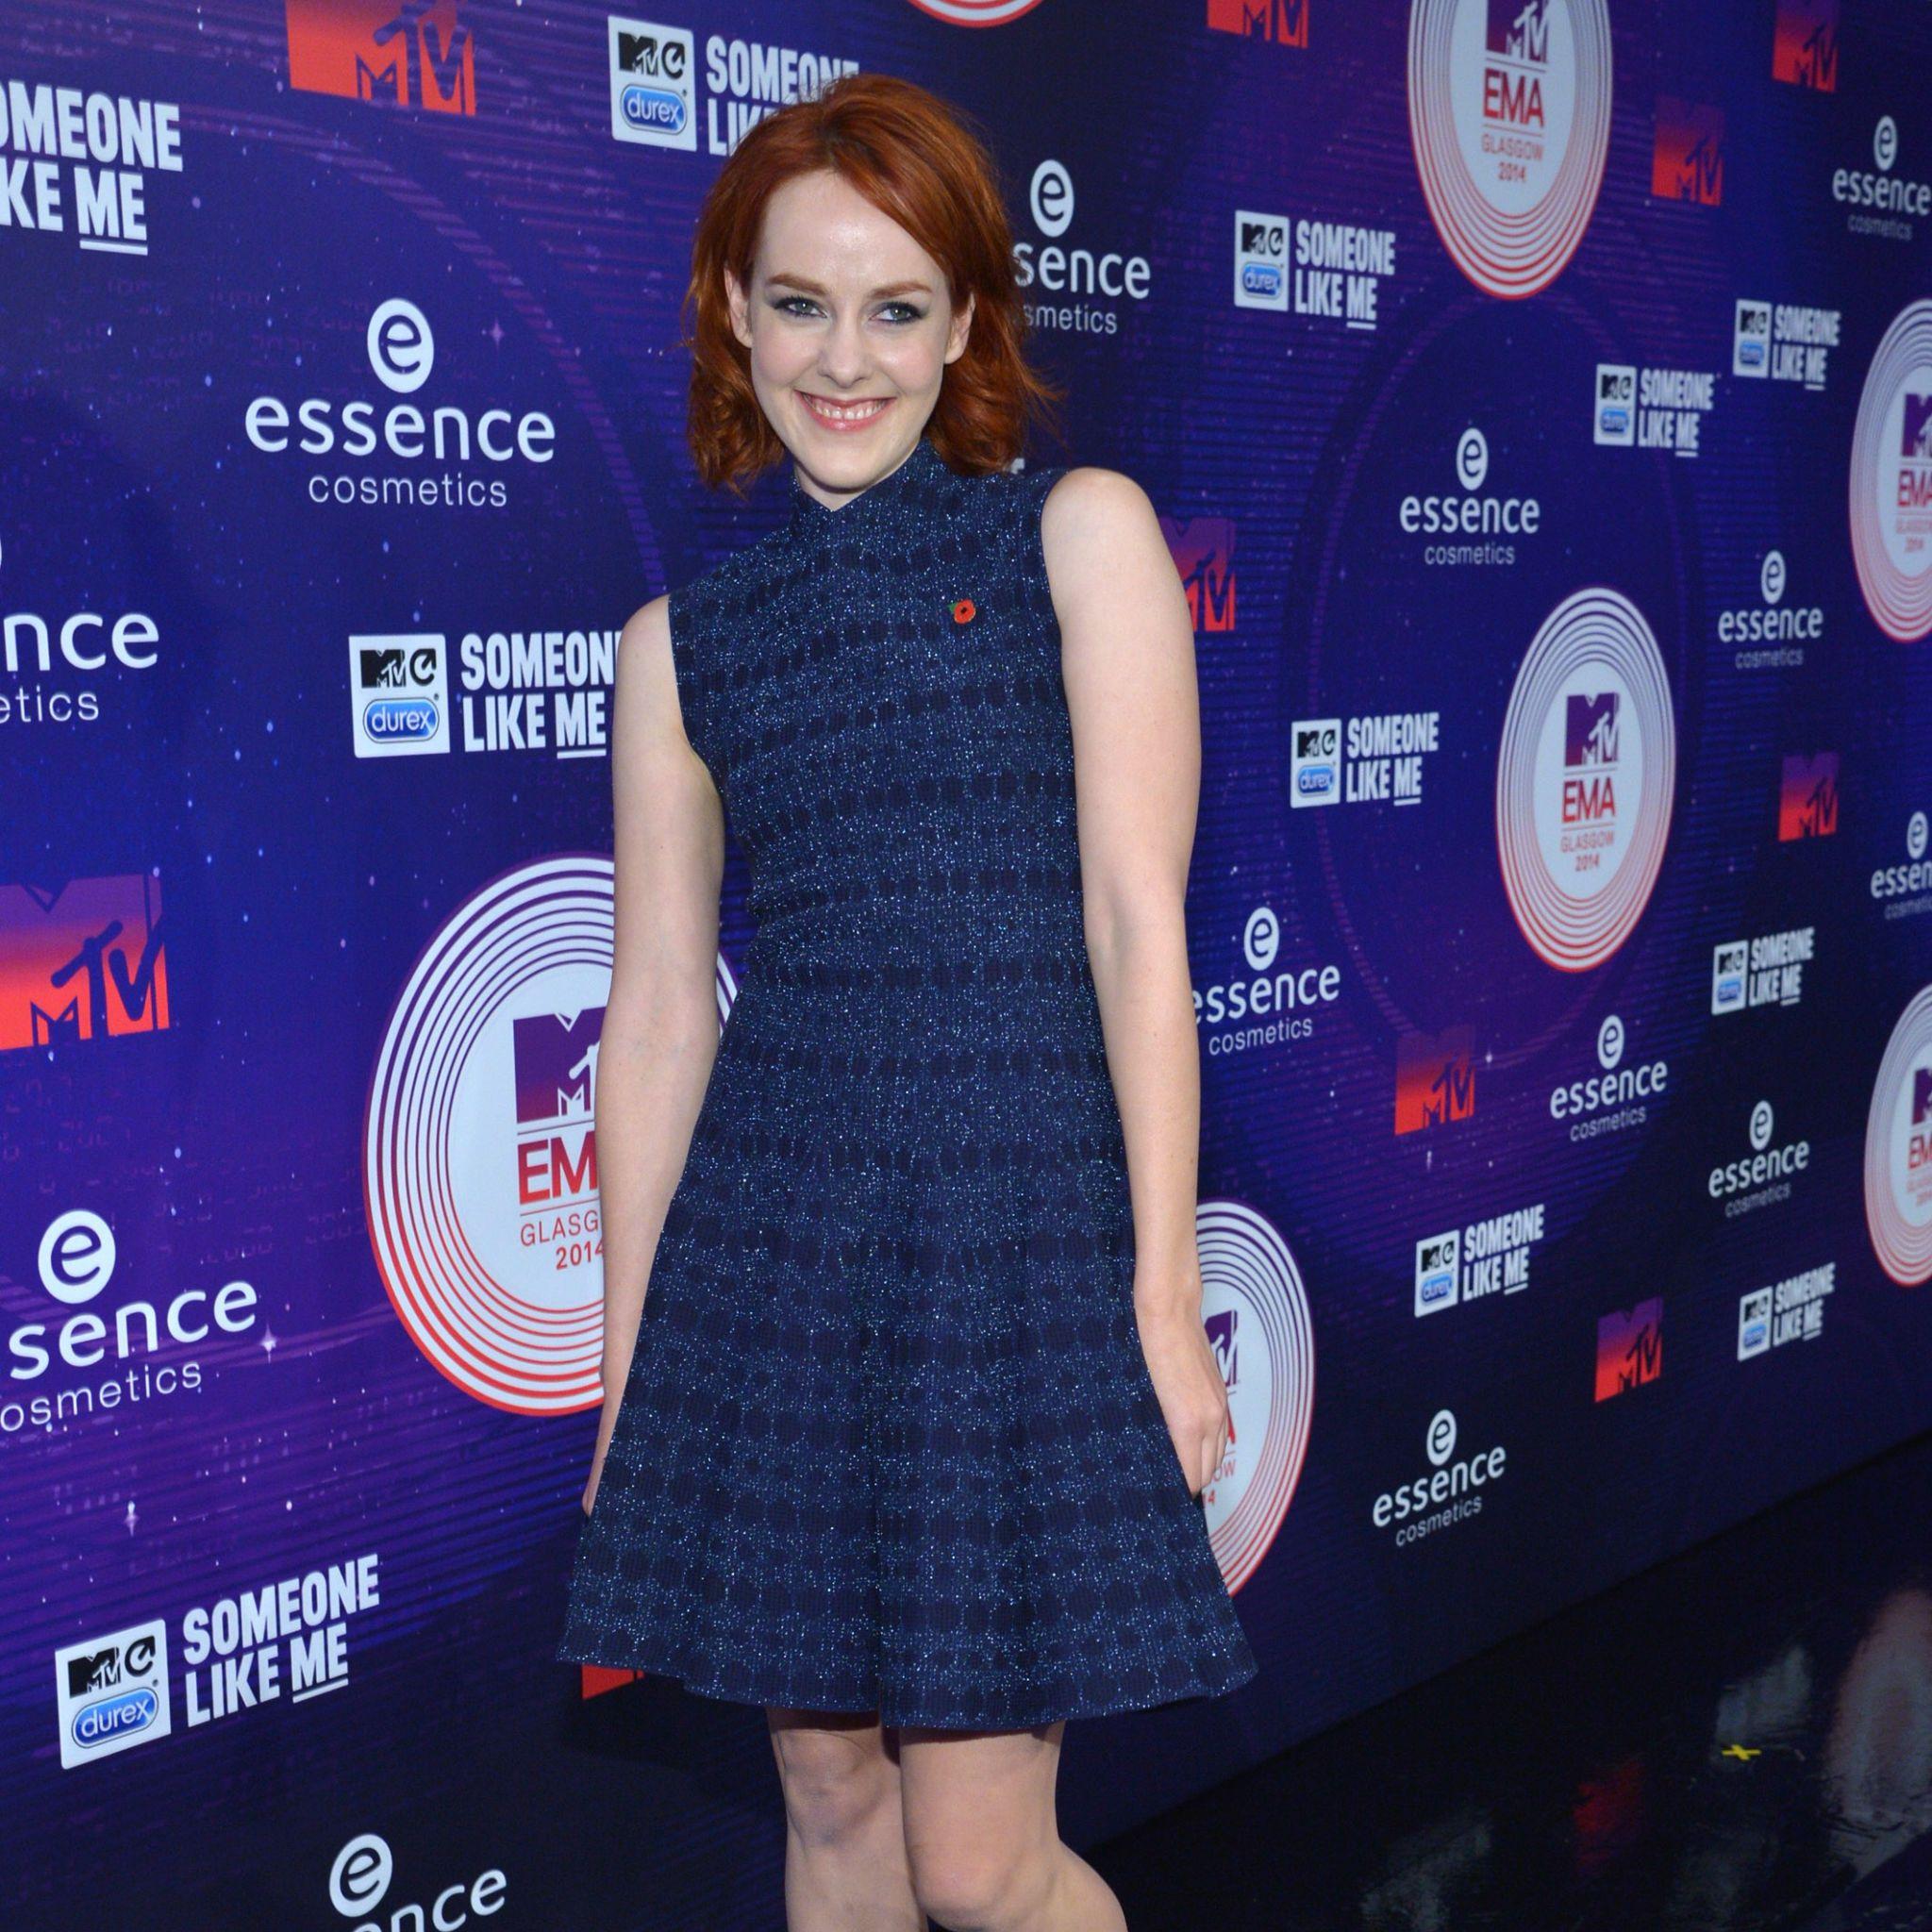 Jenna Malone at MTV EMAs 2014